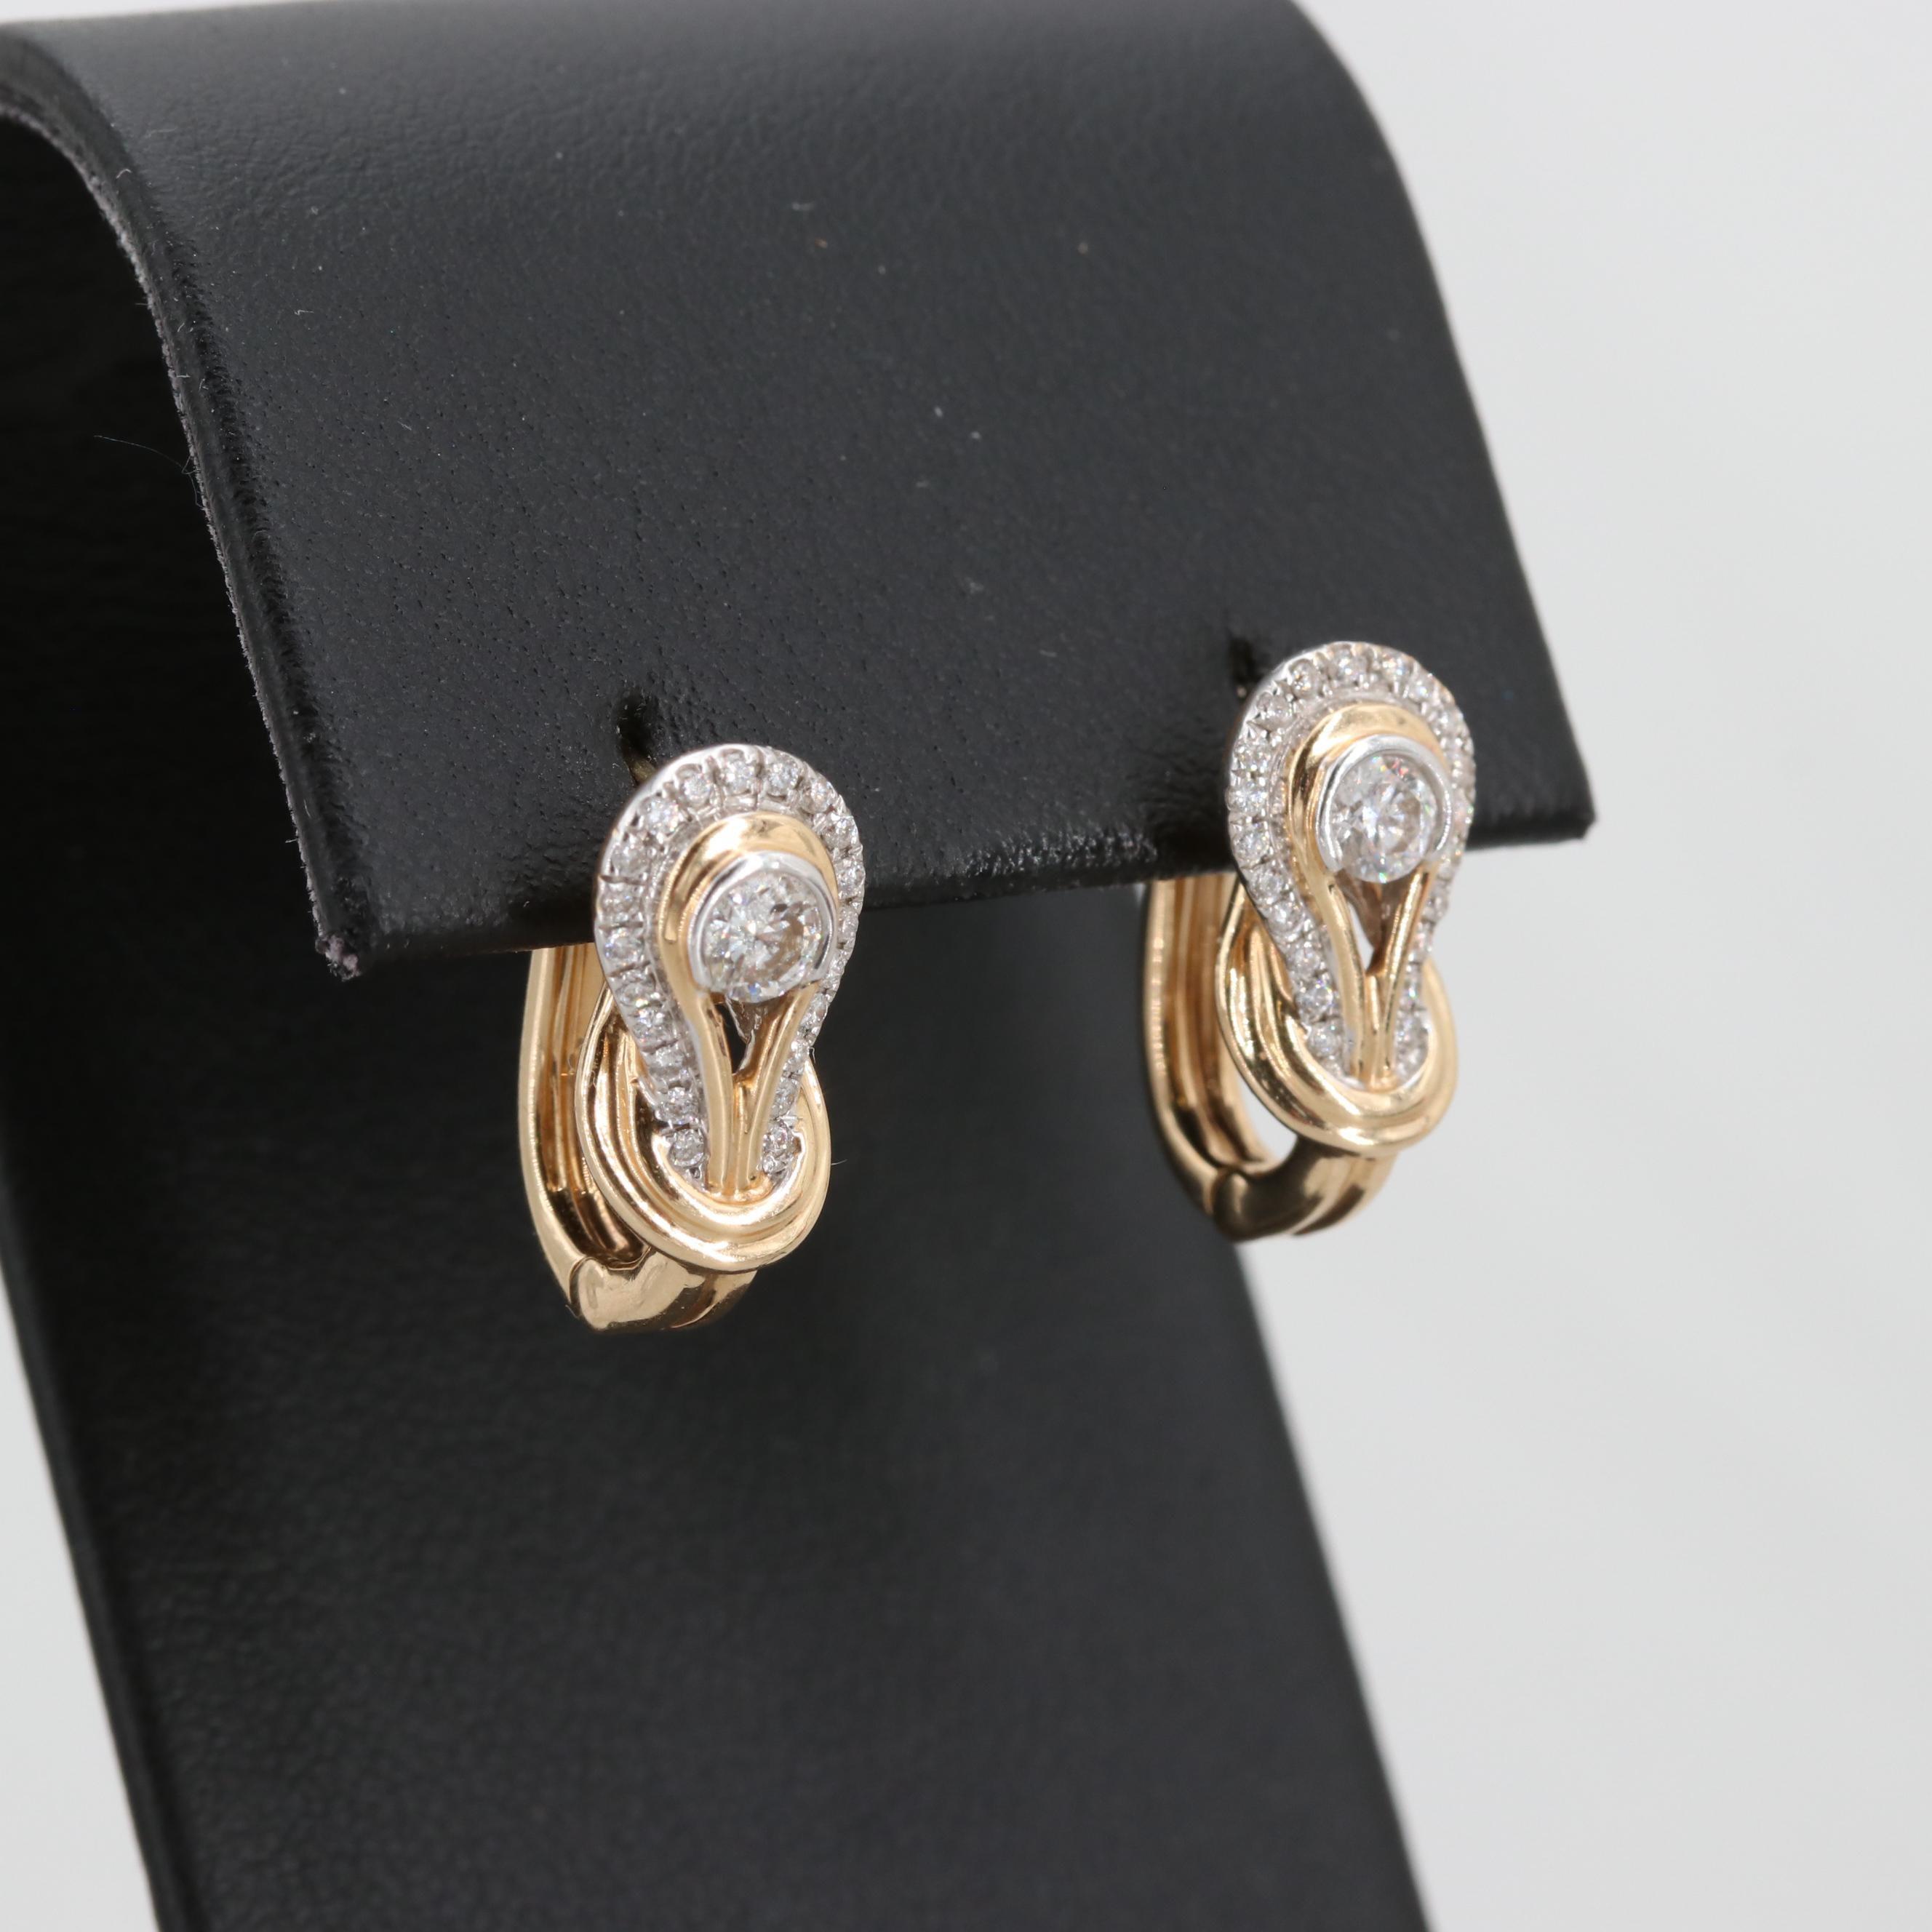 14K Yellow Gold Diamond Love Knot Earrings